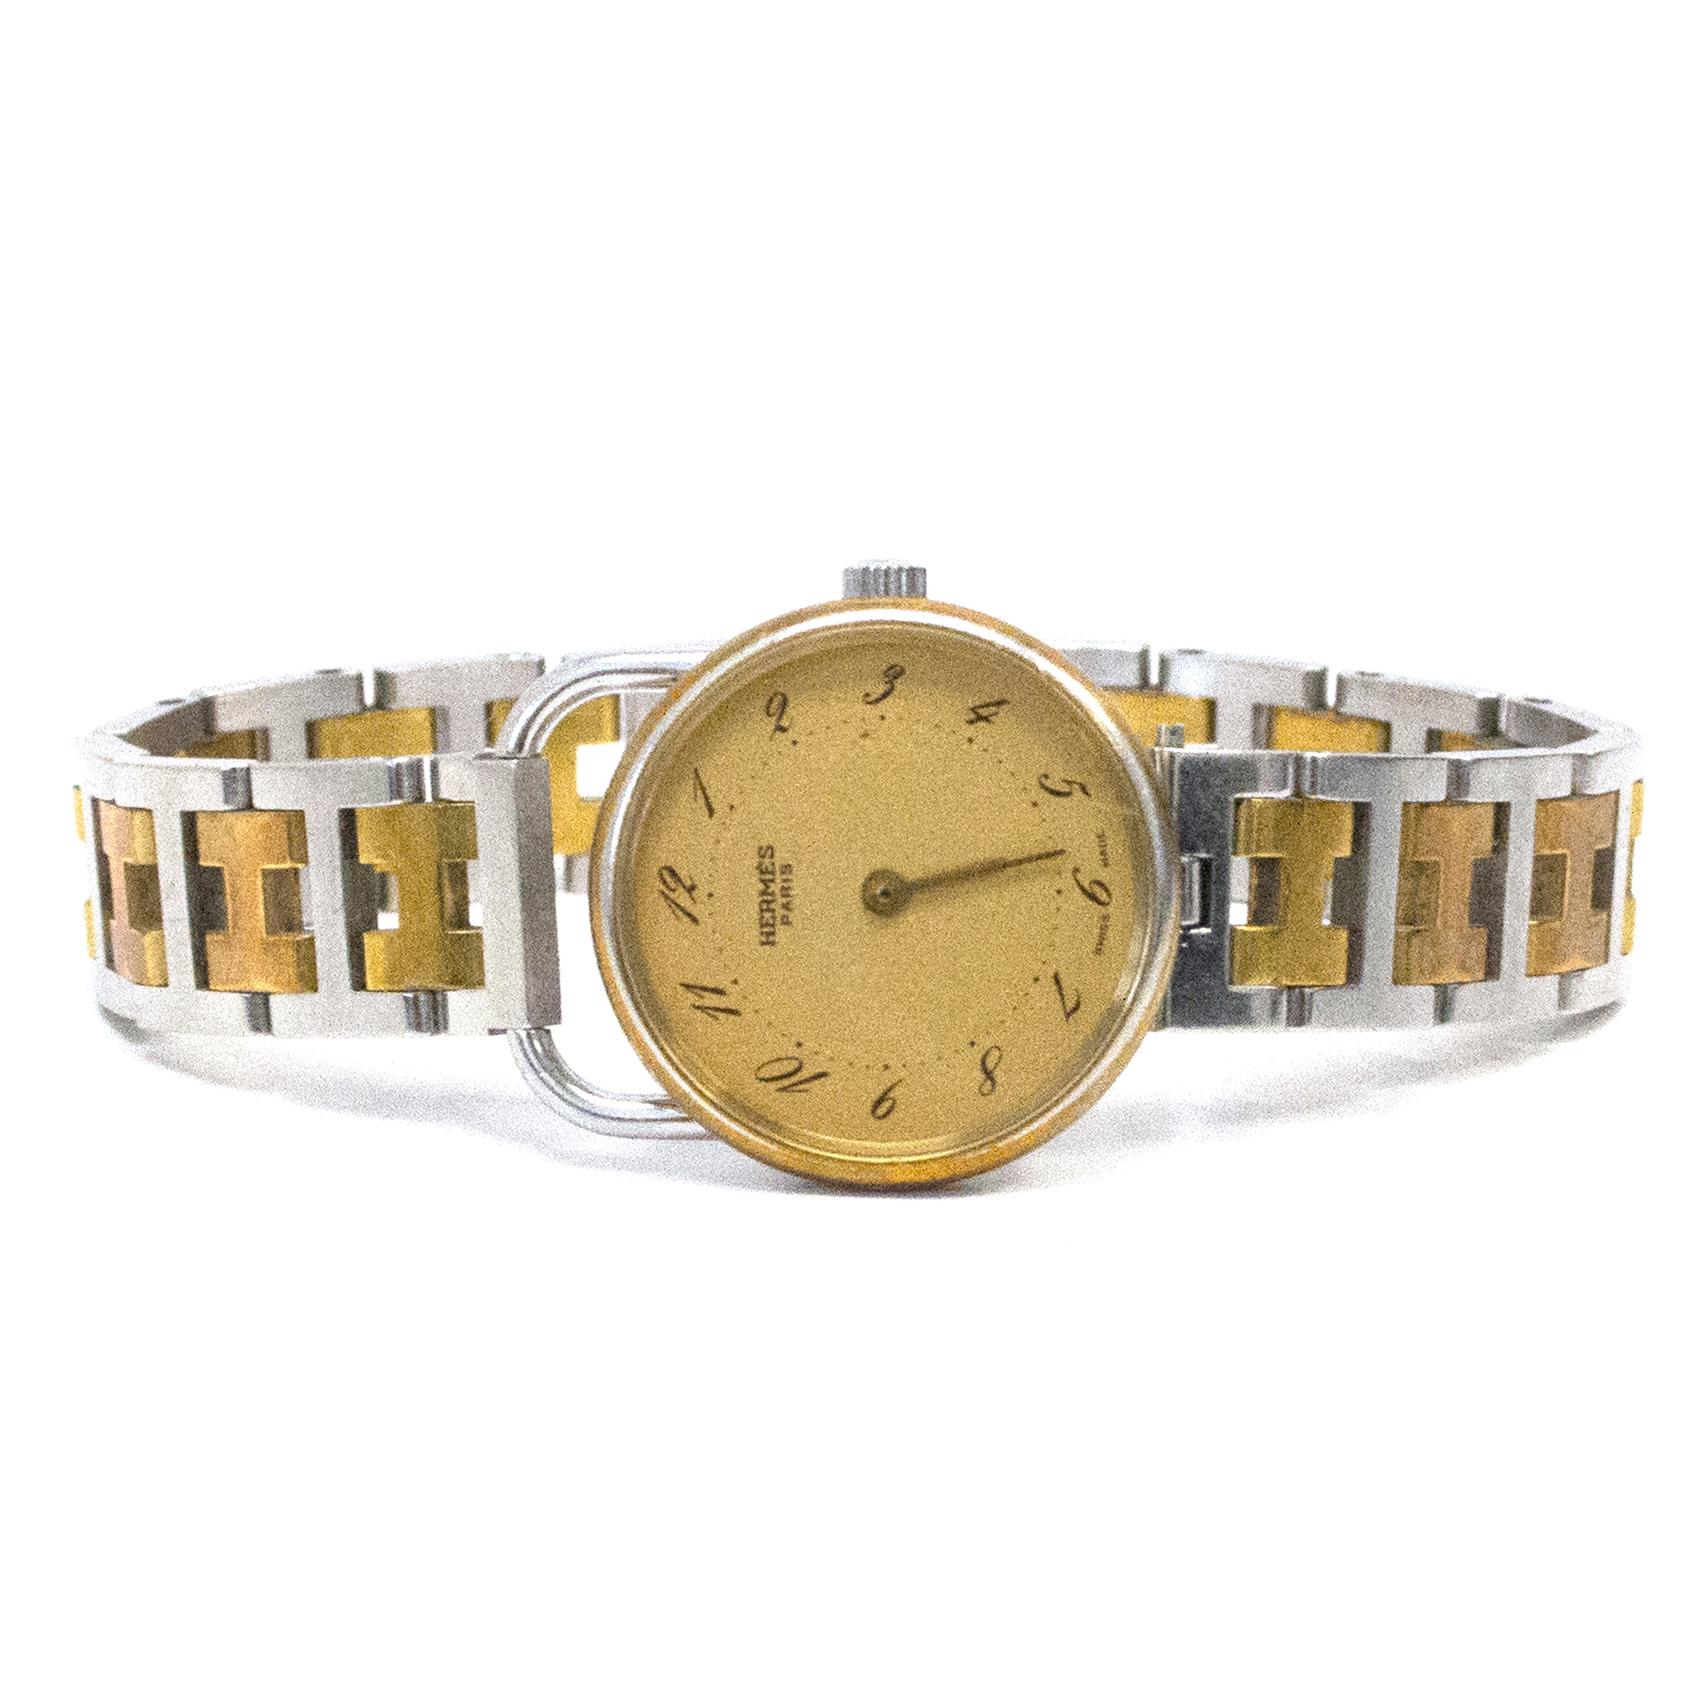 db1af31ab2f Hermes Vintage Gold And Metal Watch